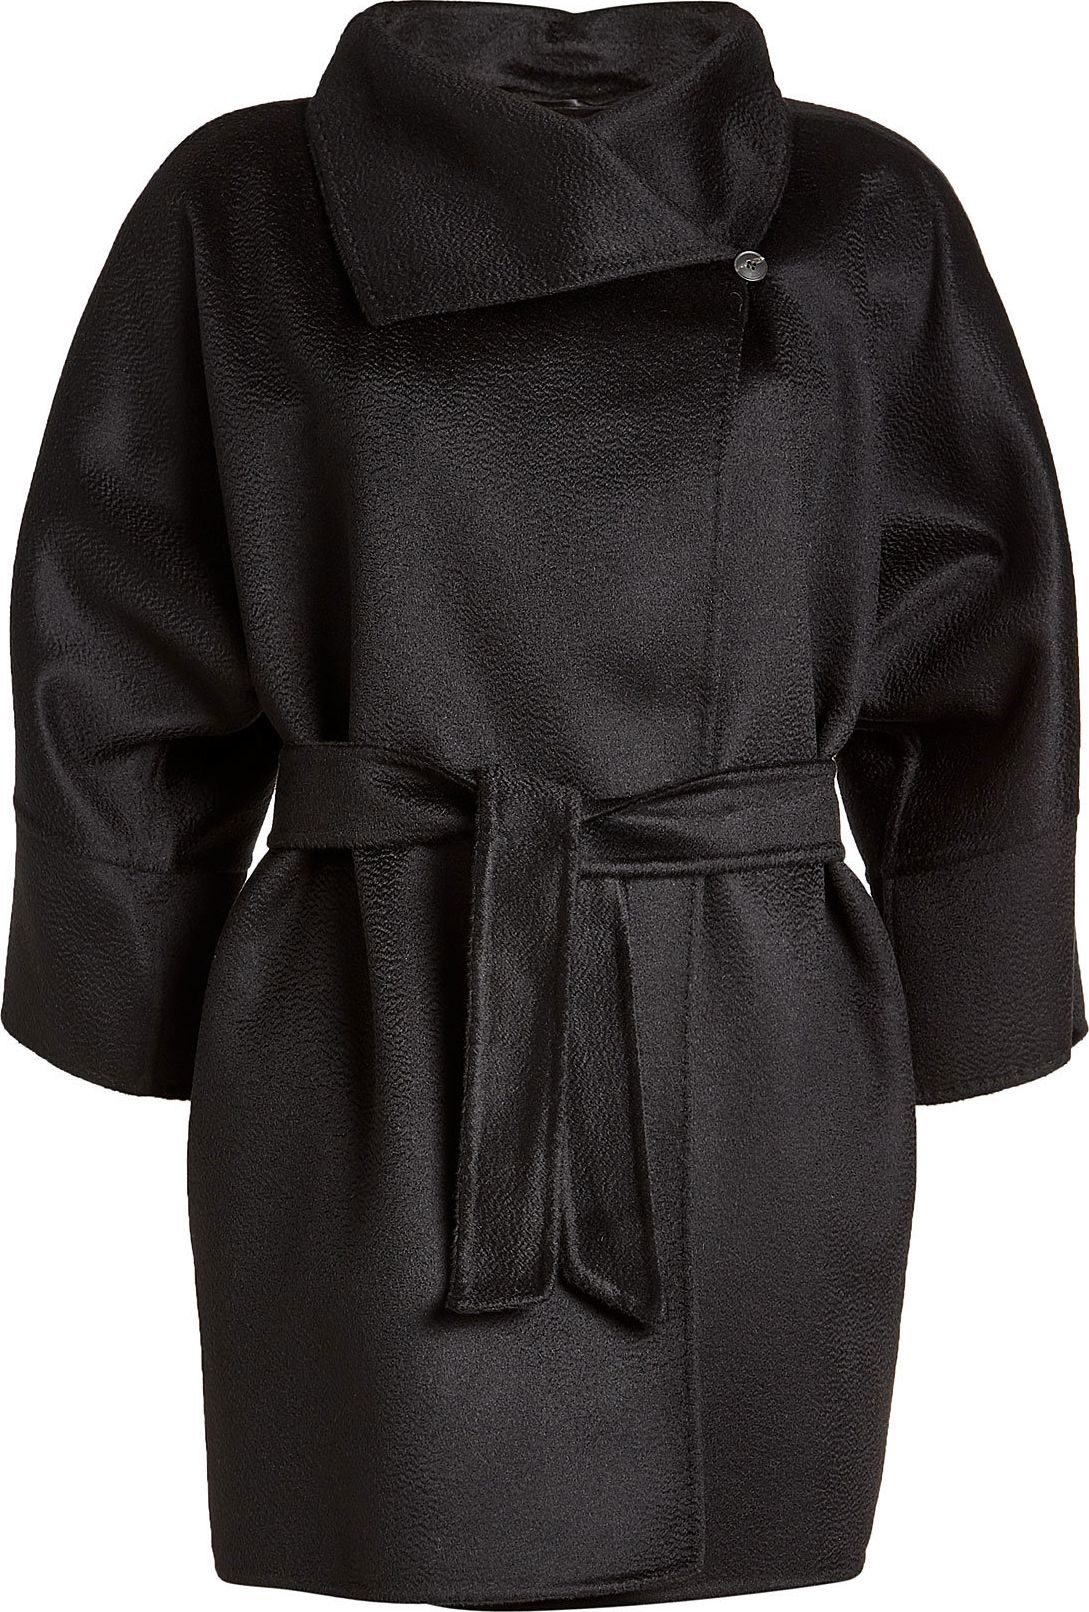 Max Mara - Belted Wool Jacket